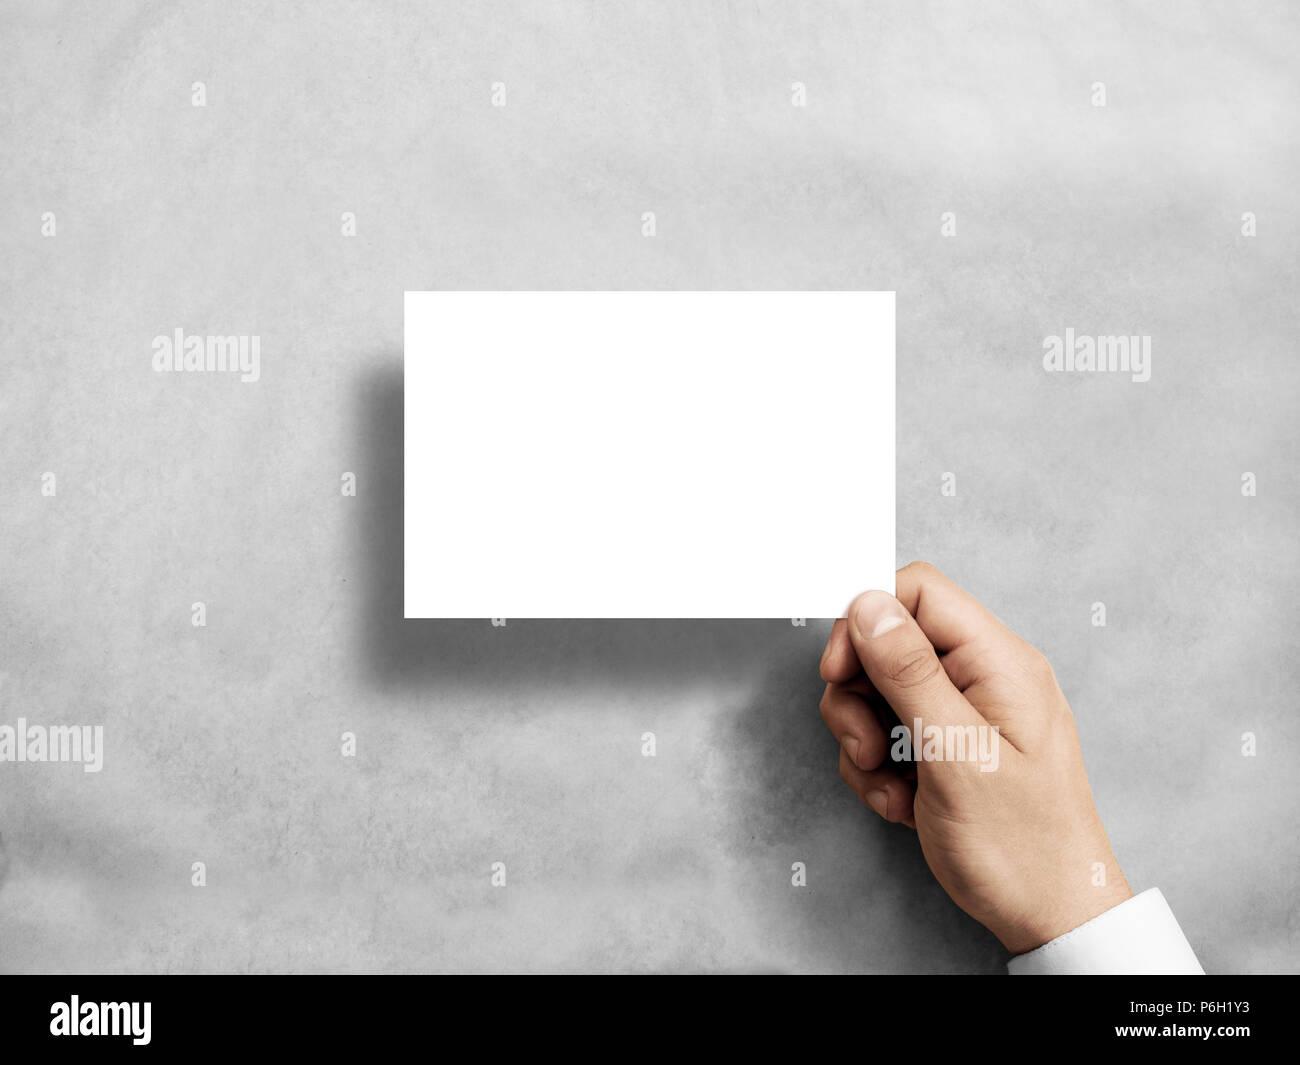 Excepcional Plantilla De Tarjeta Postal Moo Imagen - Ejemplo De ...